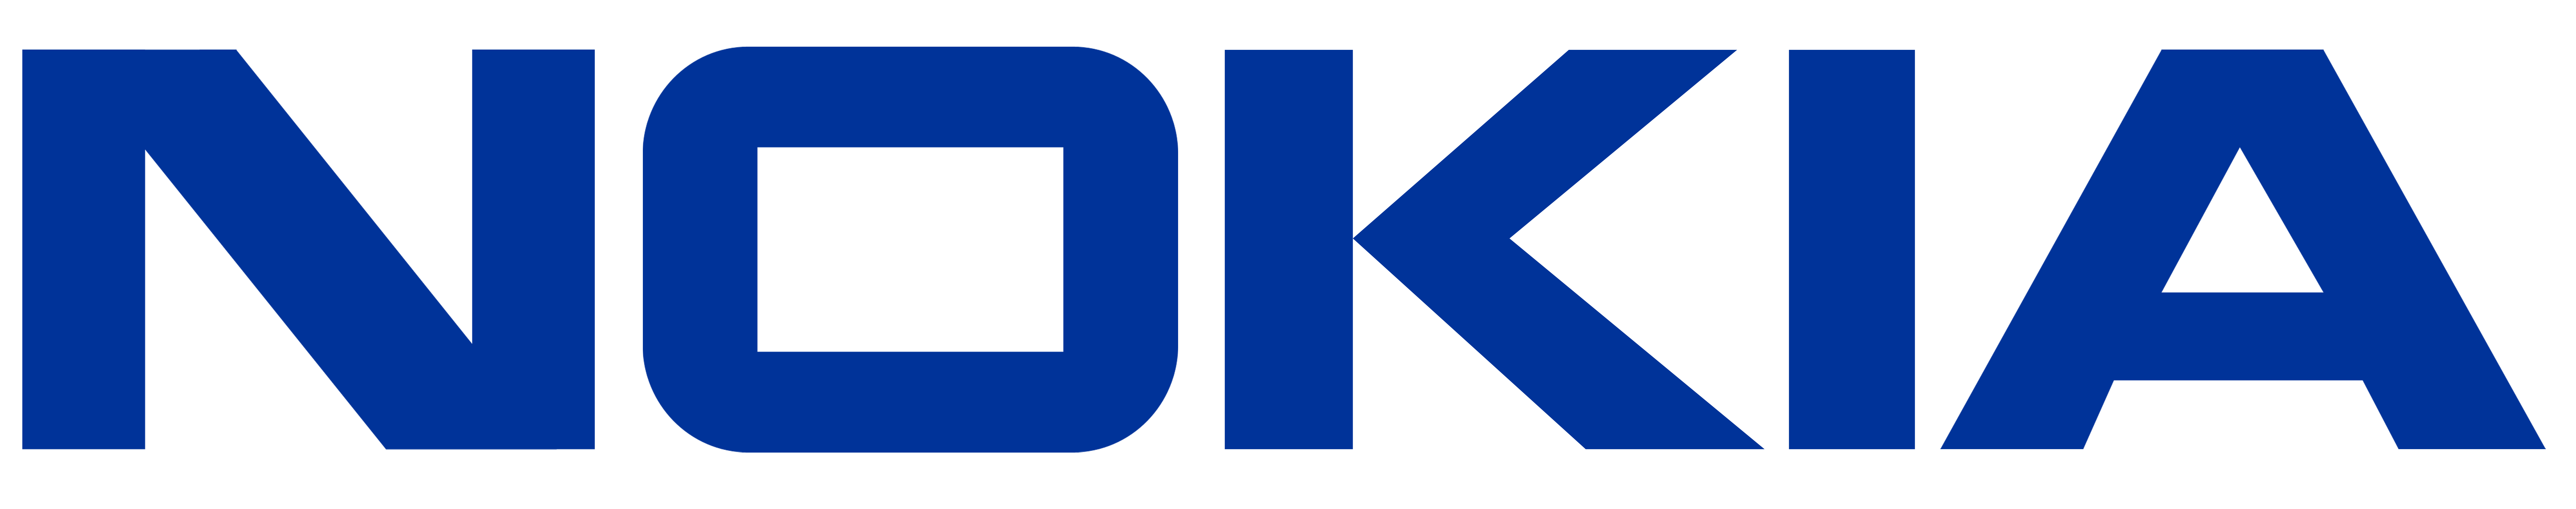 Nokia Logo Picture 1486 Free Transparent PNG Logos